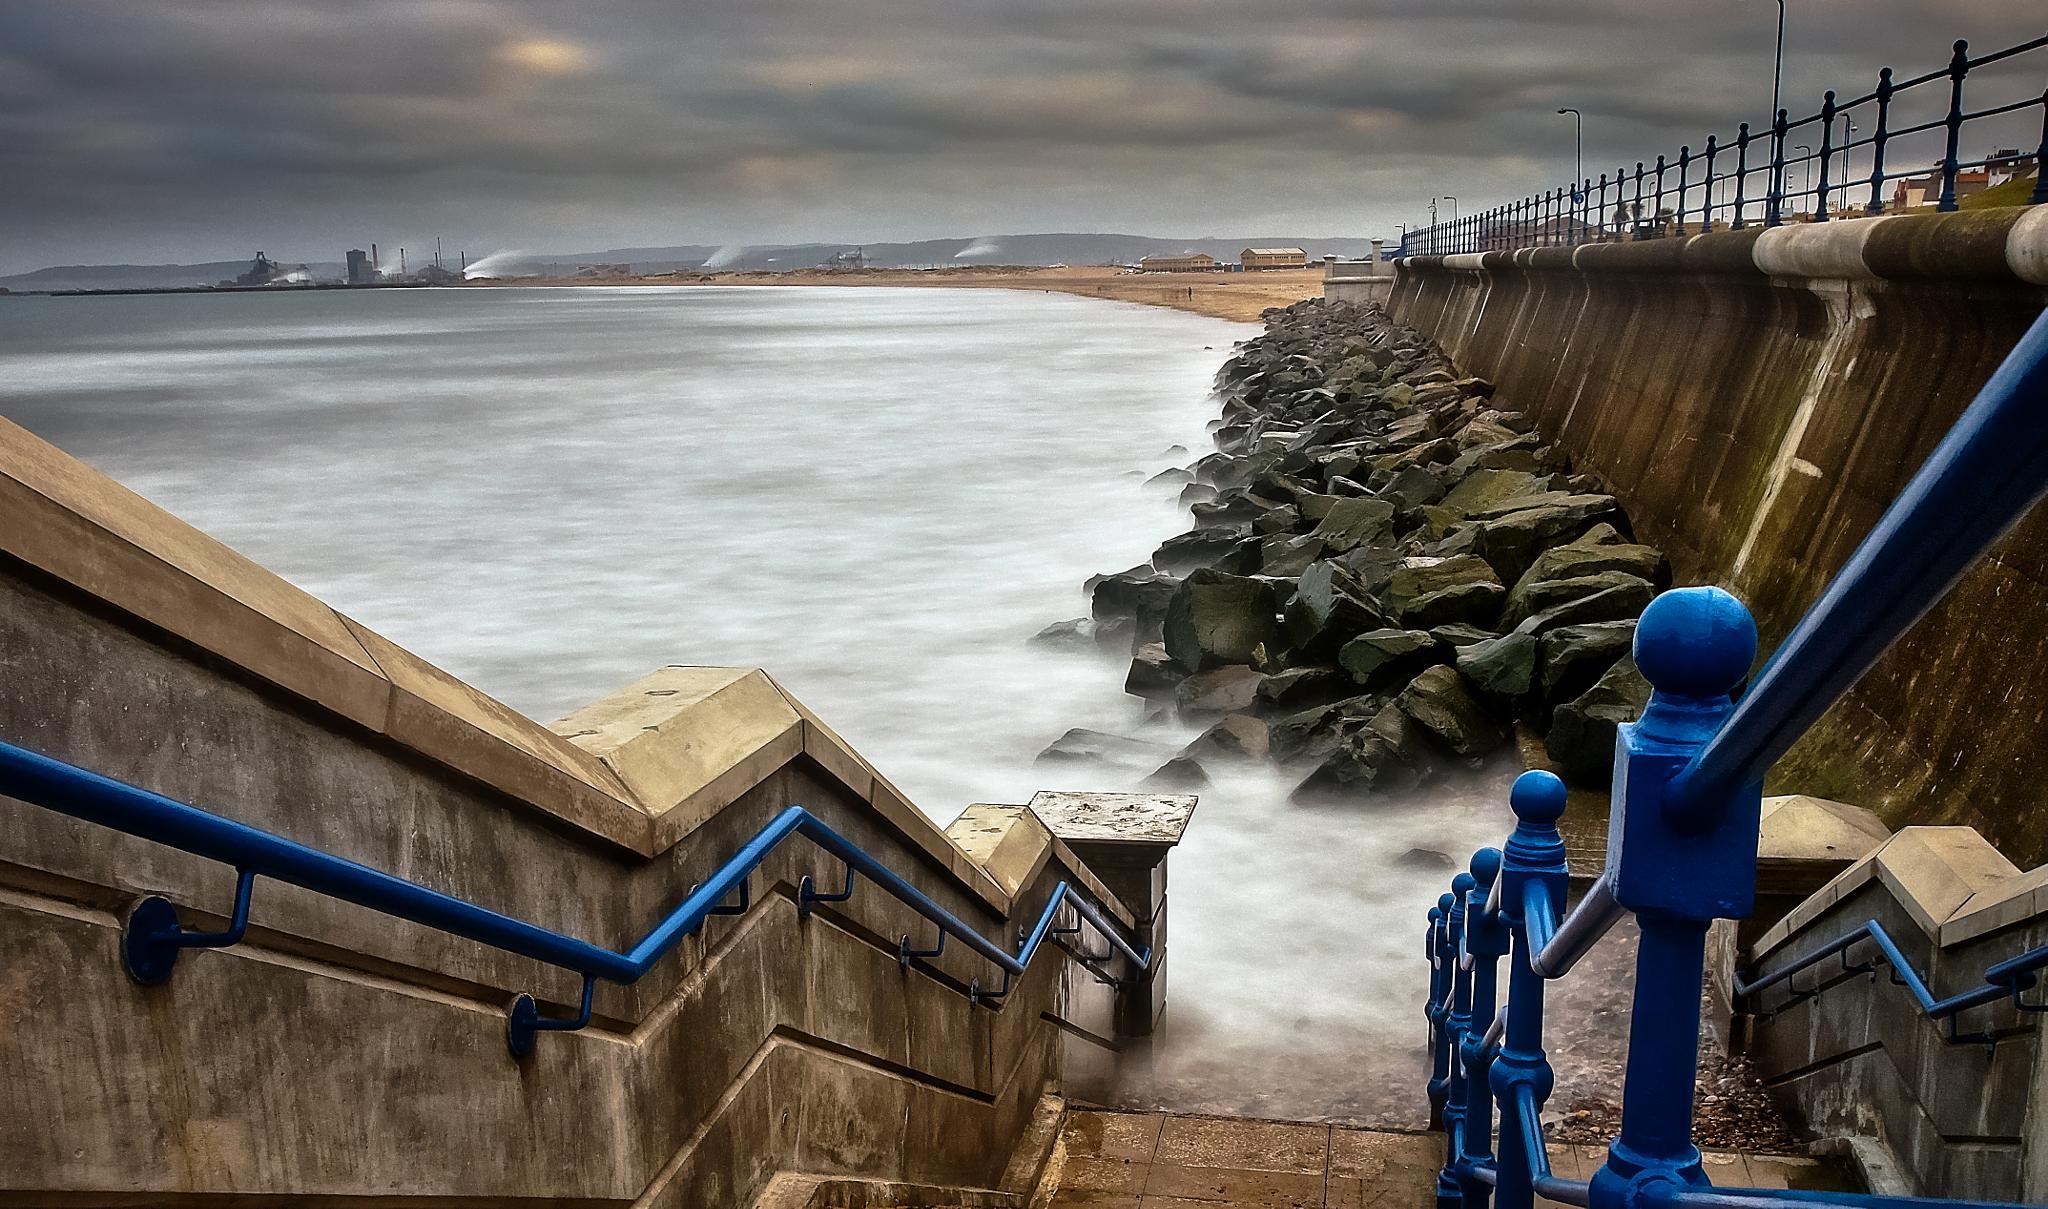 Stairway by Peter Edwardo Vicente.